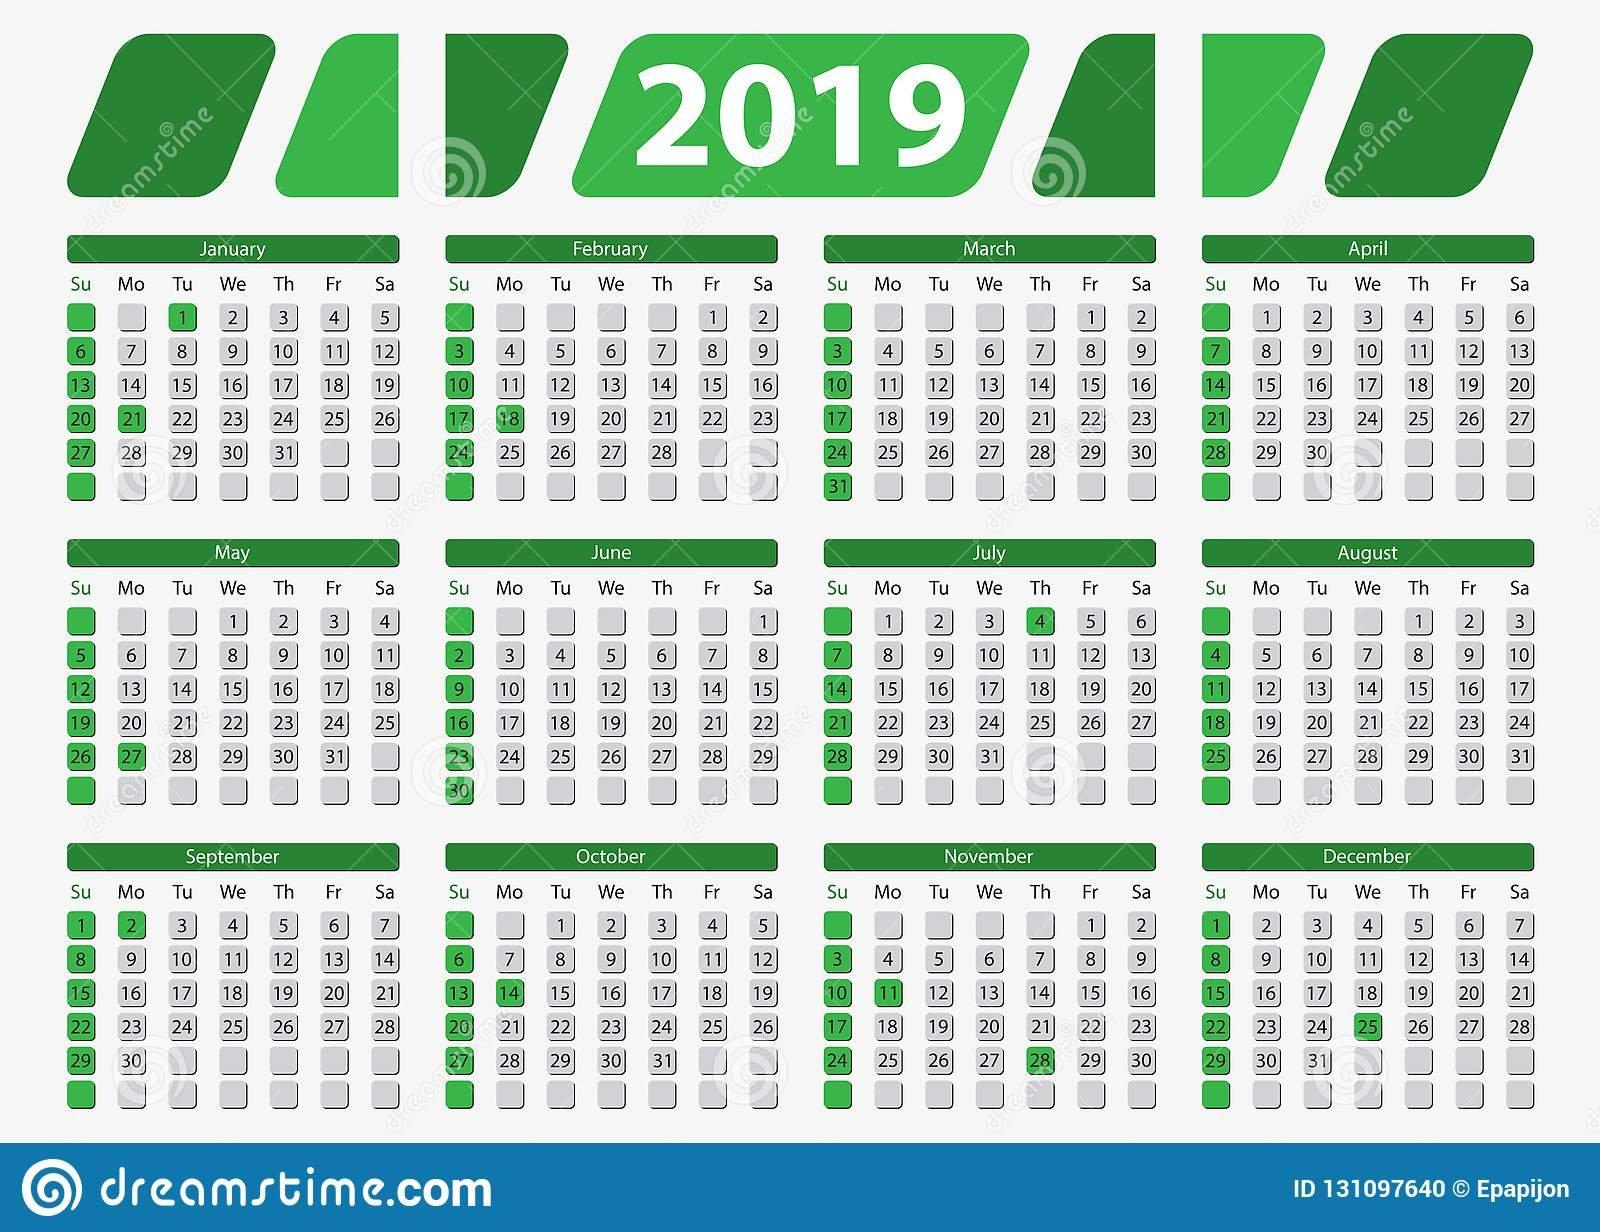 Usa Calendar 2019 With Official Holidays, 5X7 In Stock Vector 5 X 7 2019 Calendar